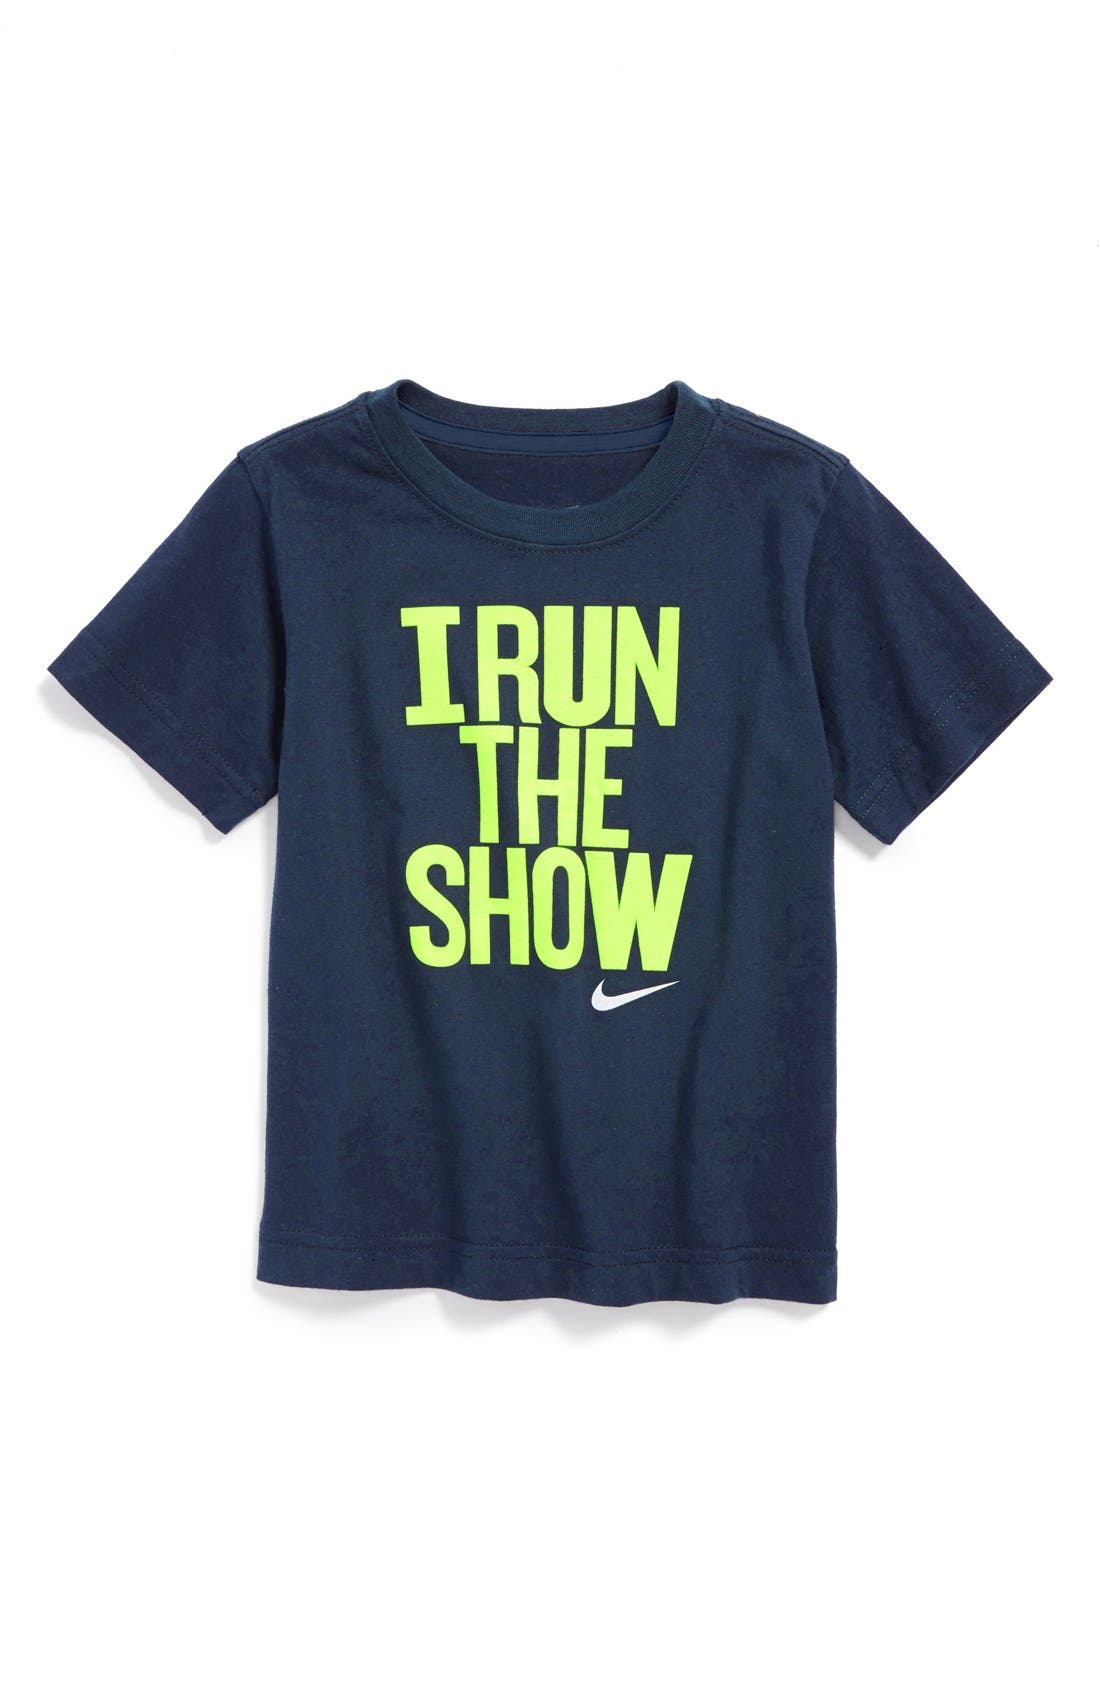 Main Image - Nike 'I Run The Show' Dri-FIT T-Shirt (Toddler Boys)